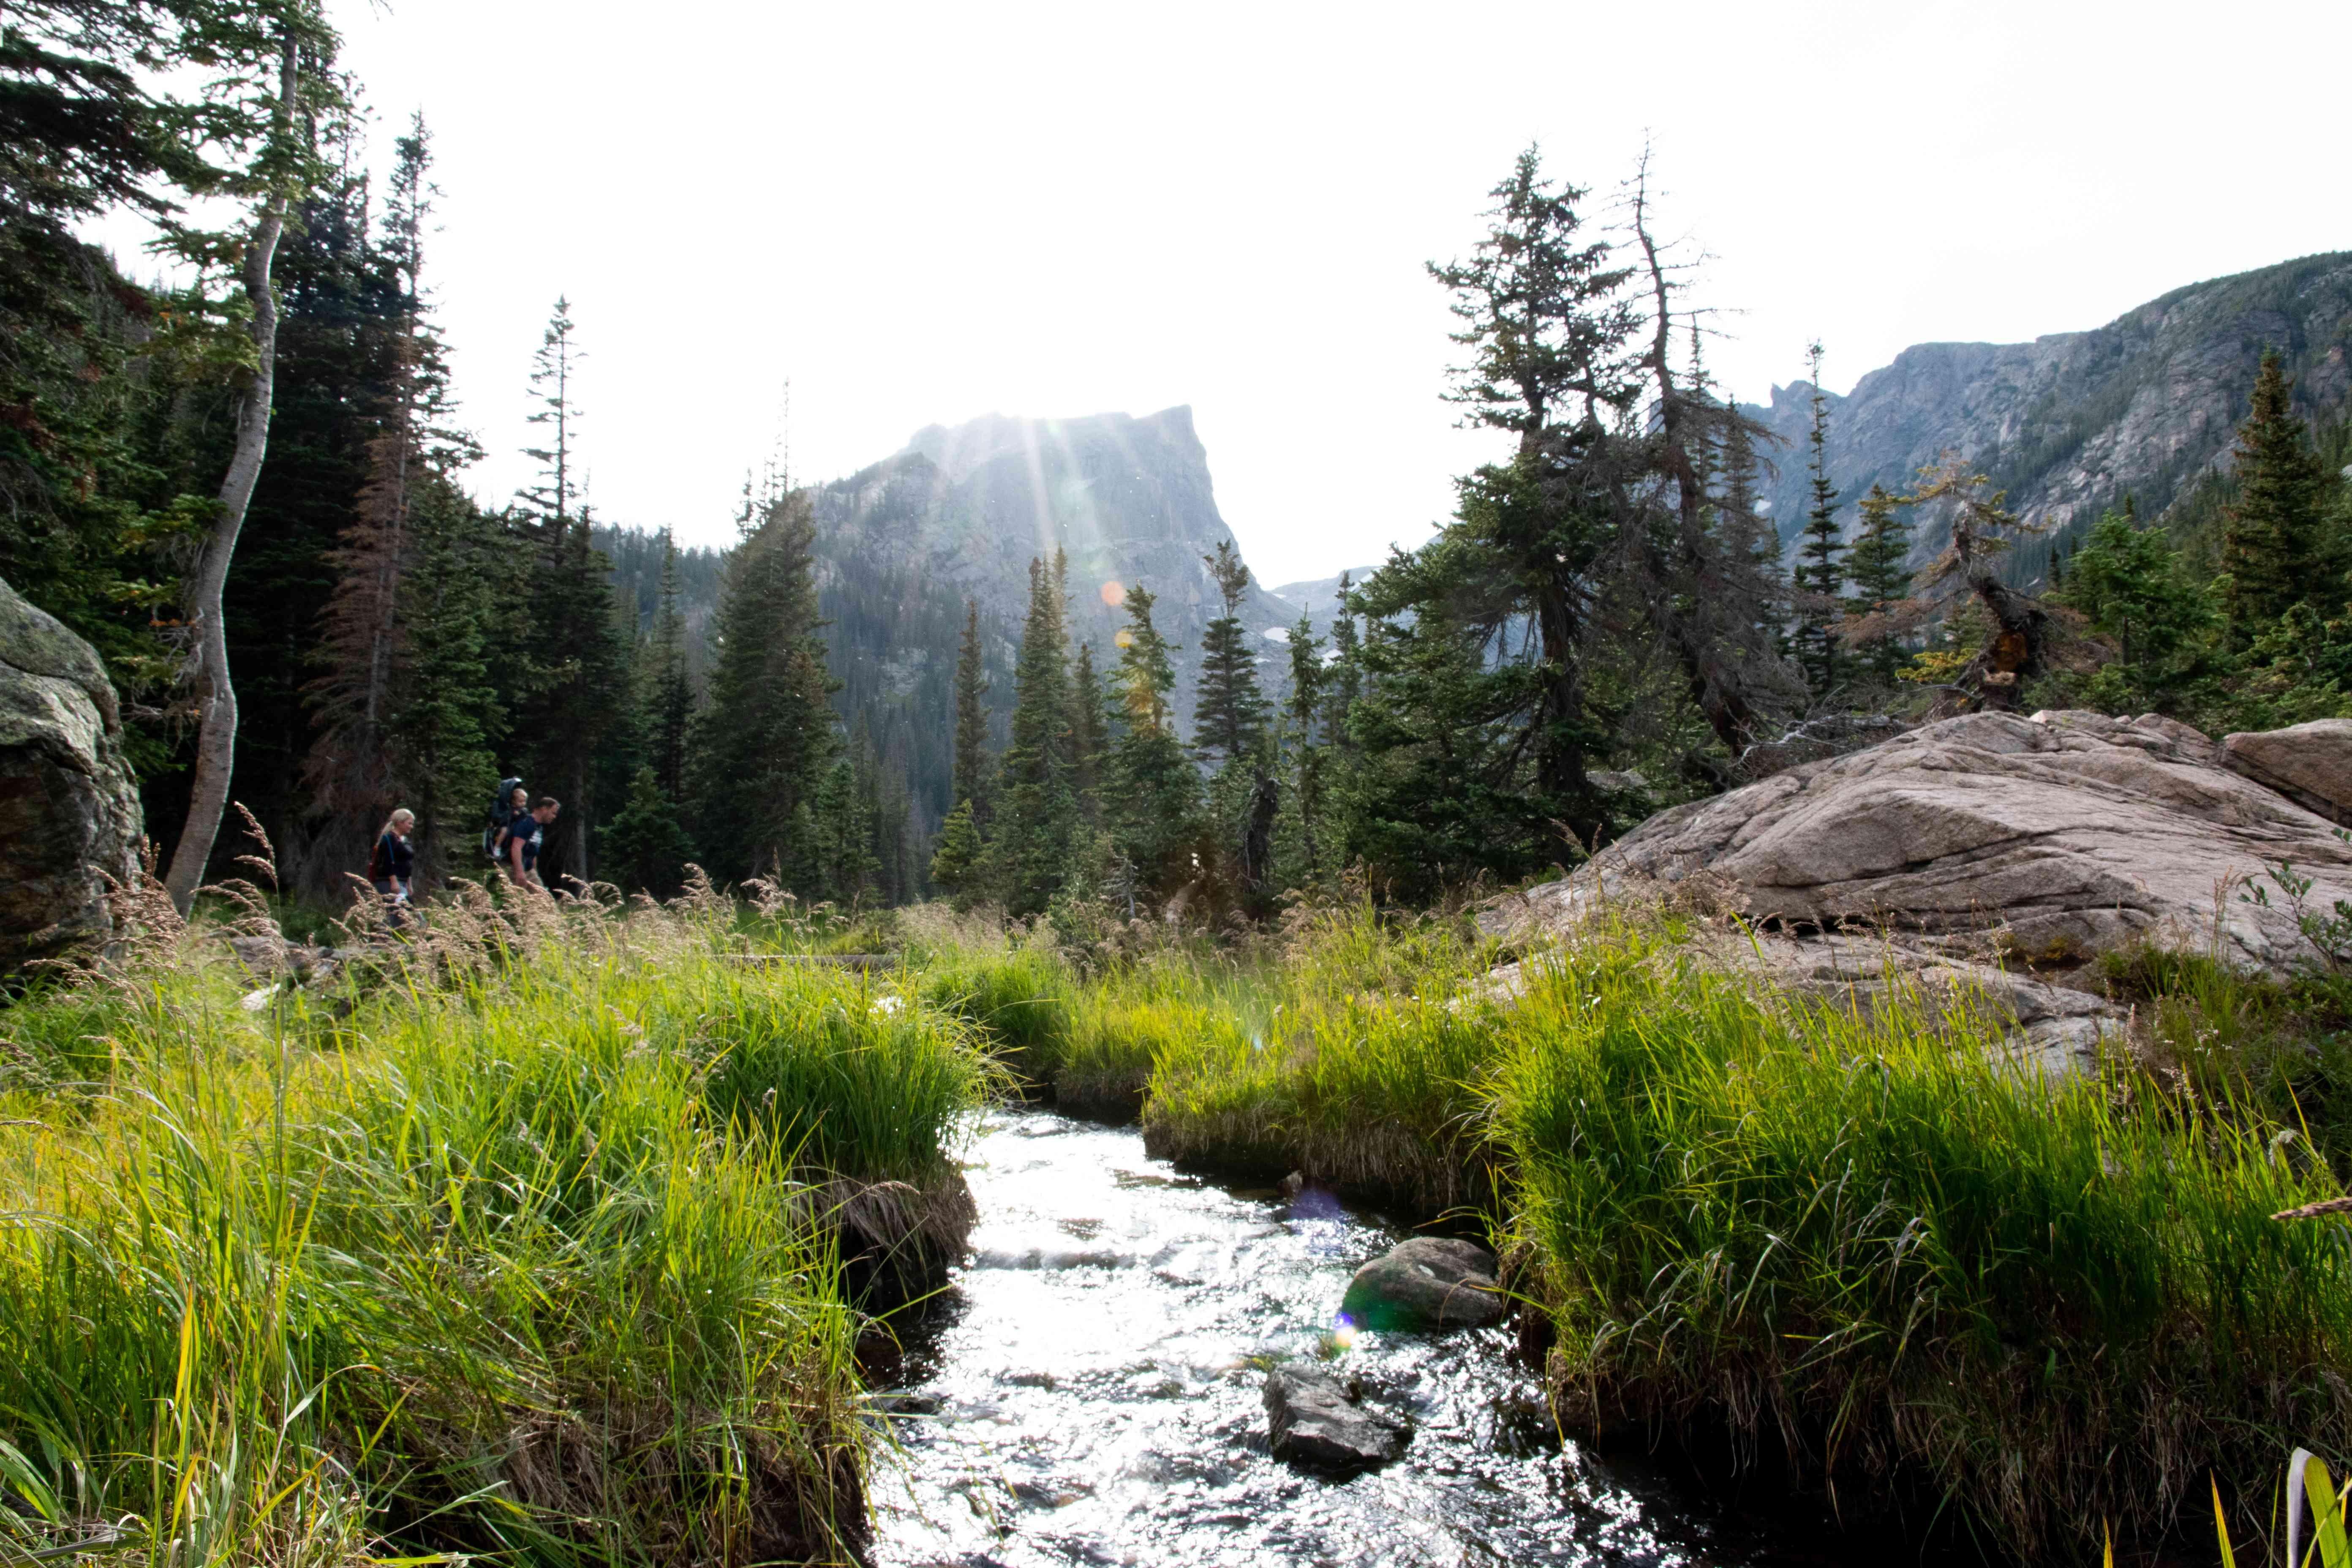 landscape shot of running stream in mountainous landscape